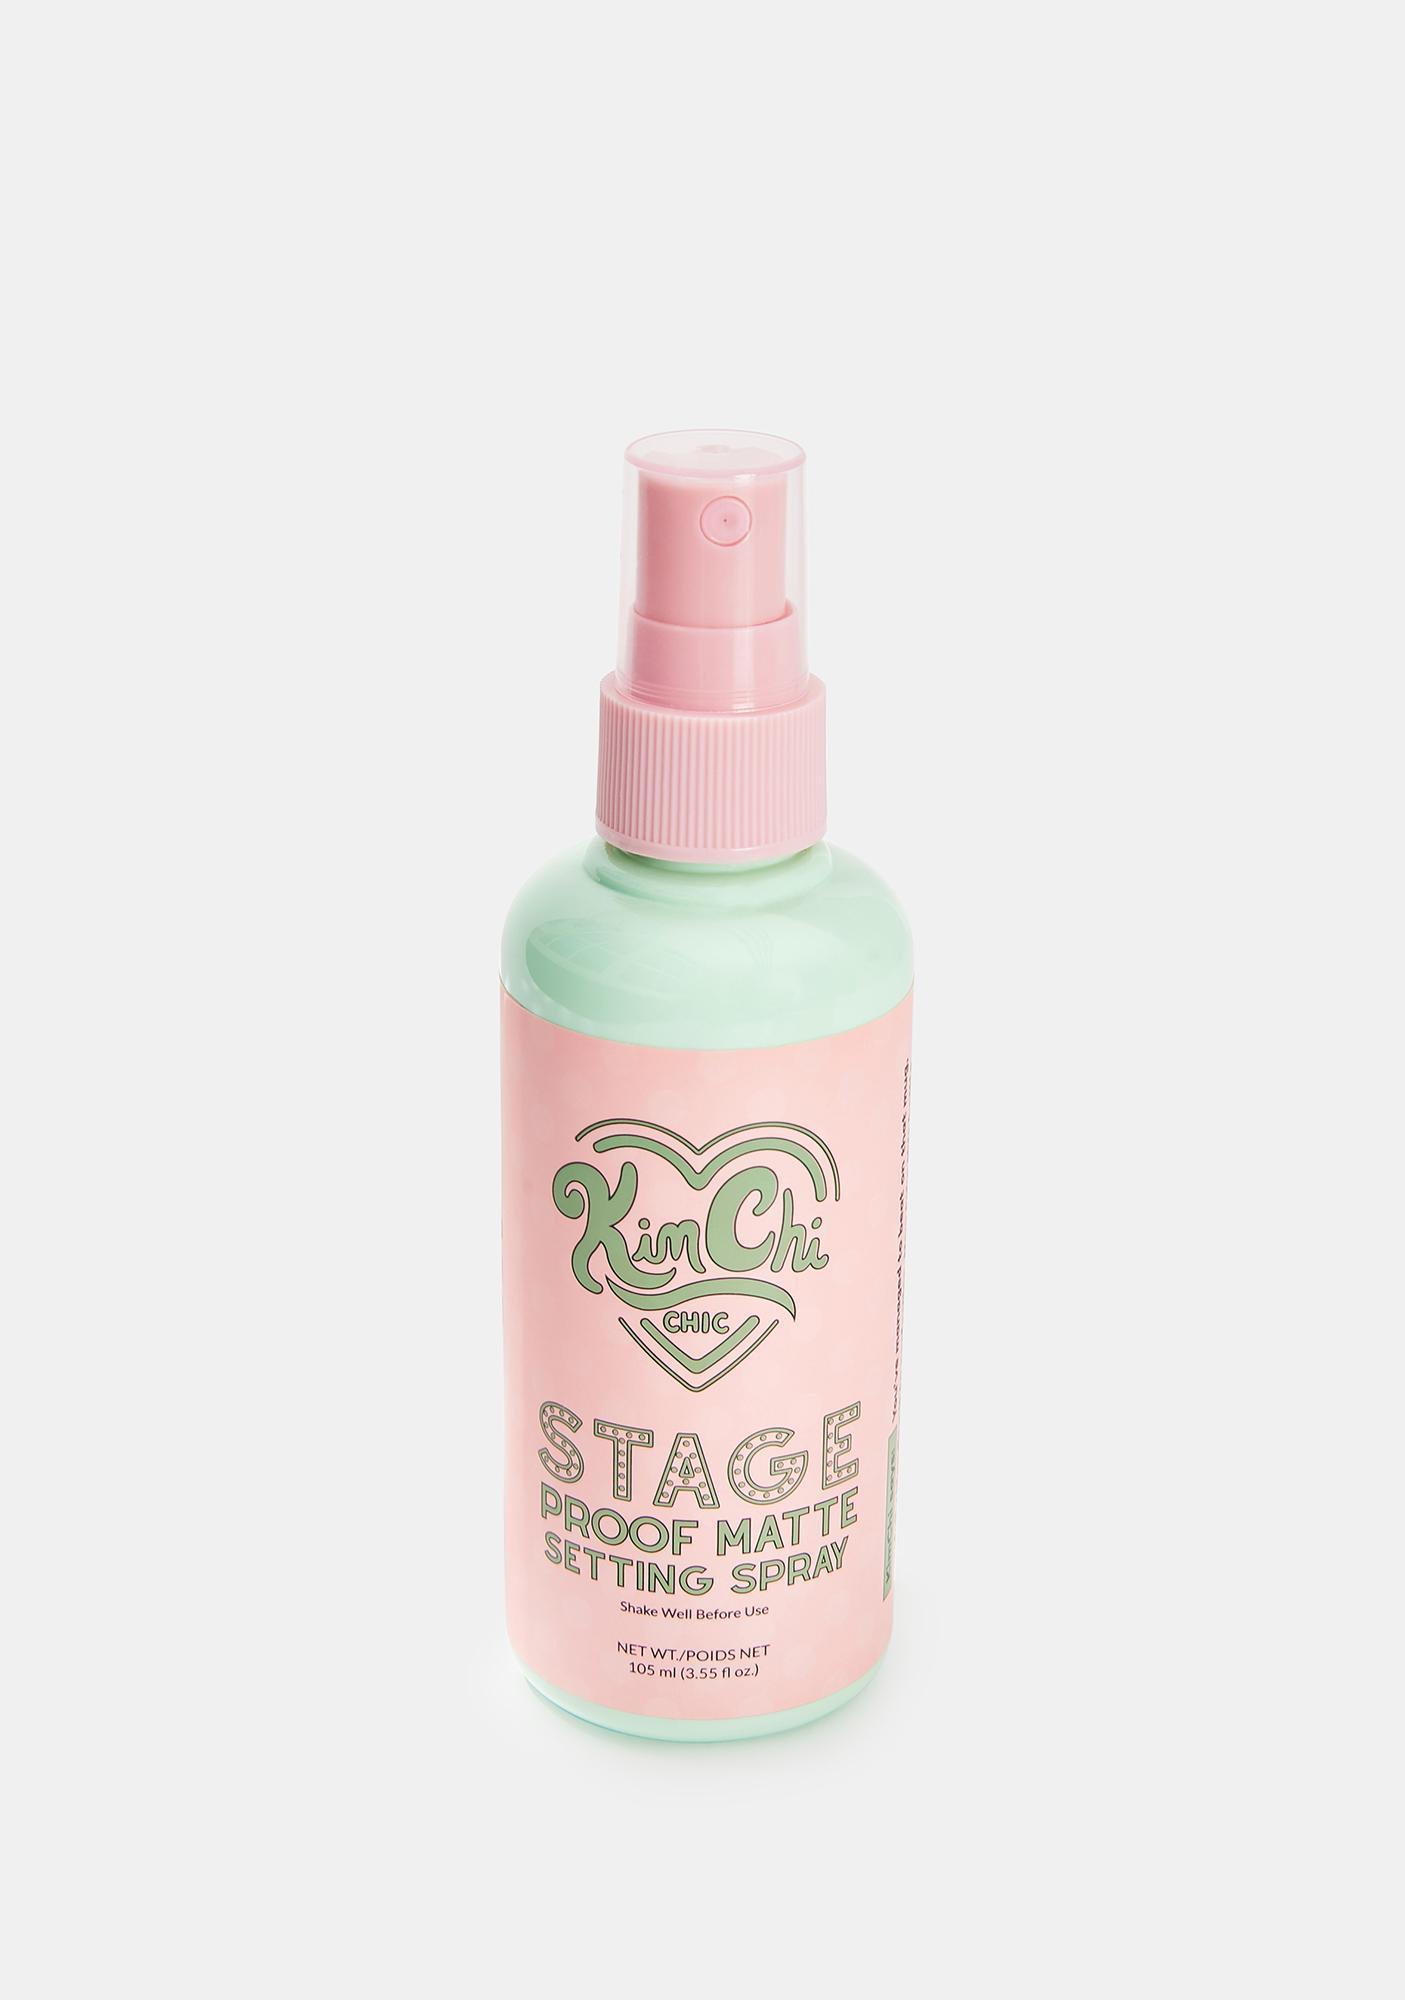 KimChi Chic Beauty Stage Proof Matte Setting Spray